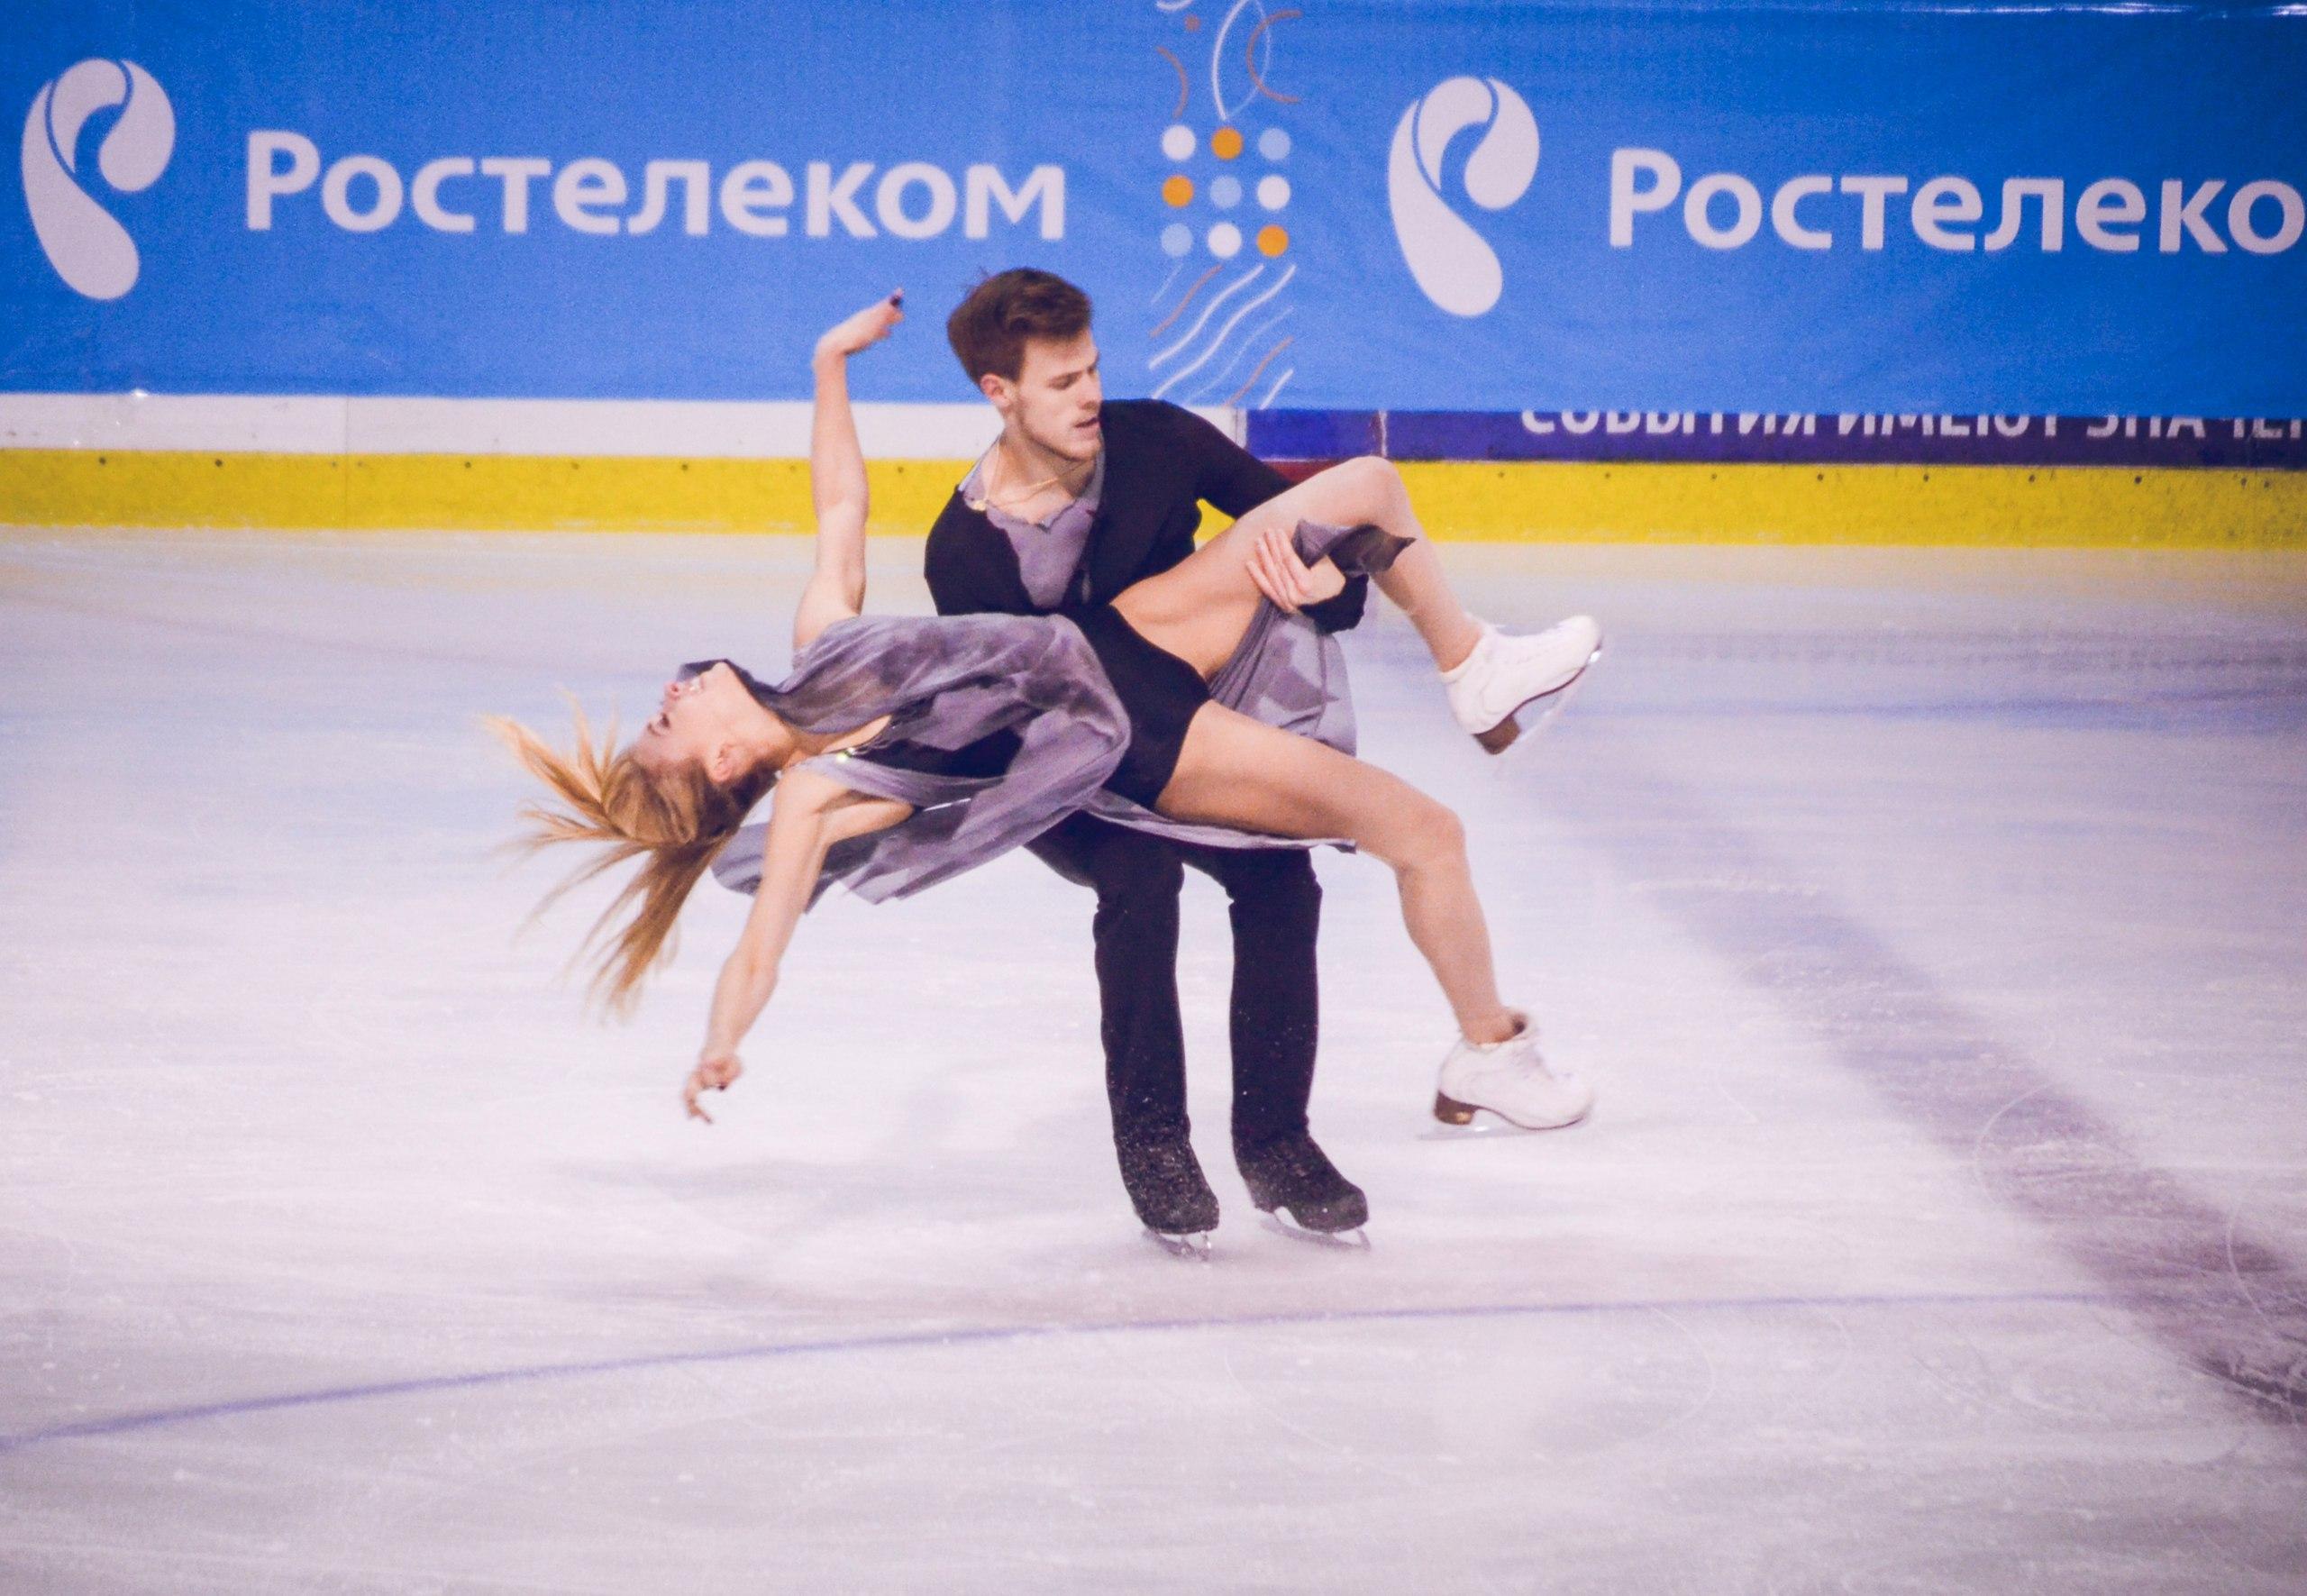 Виктория Синицина - Никита Кацалапов - 7 - Страница 3 IEQgCvI6wKw